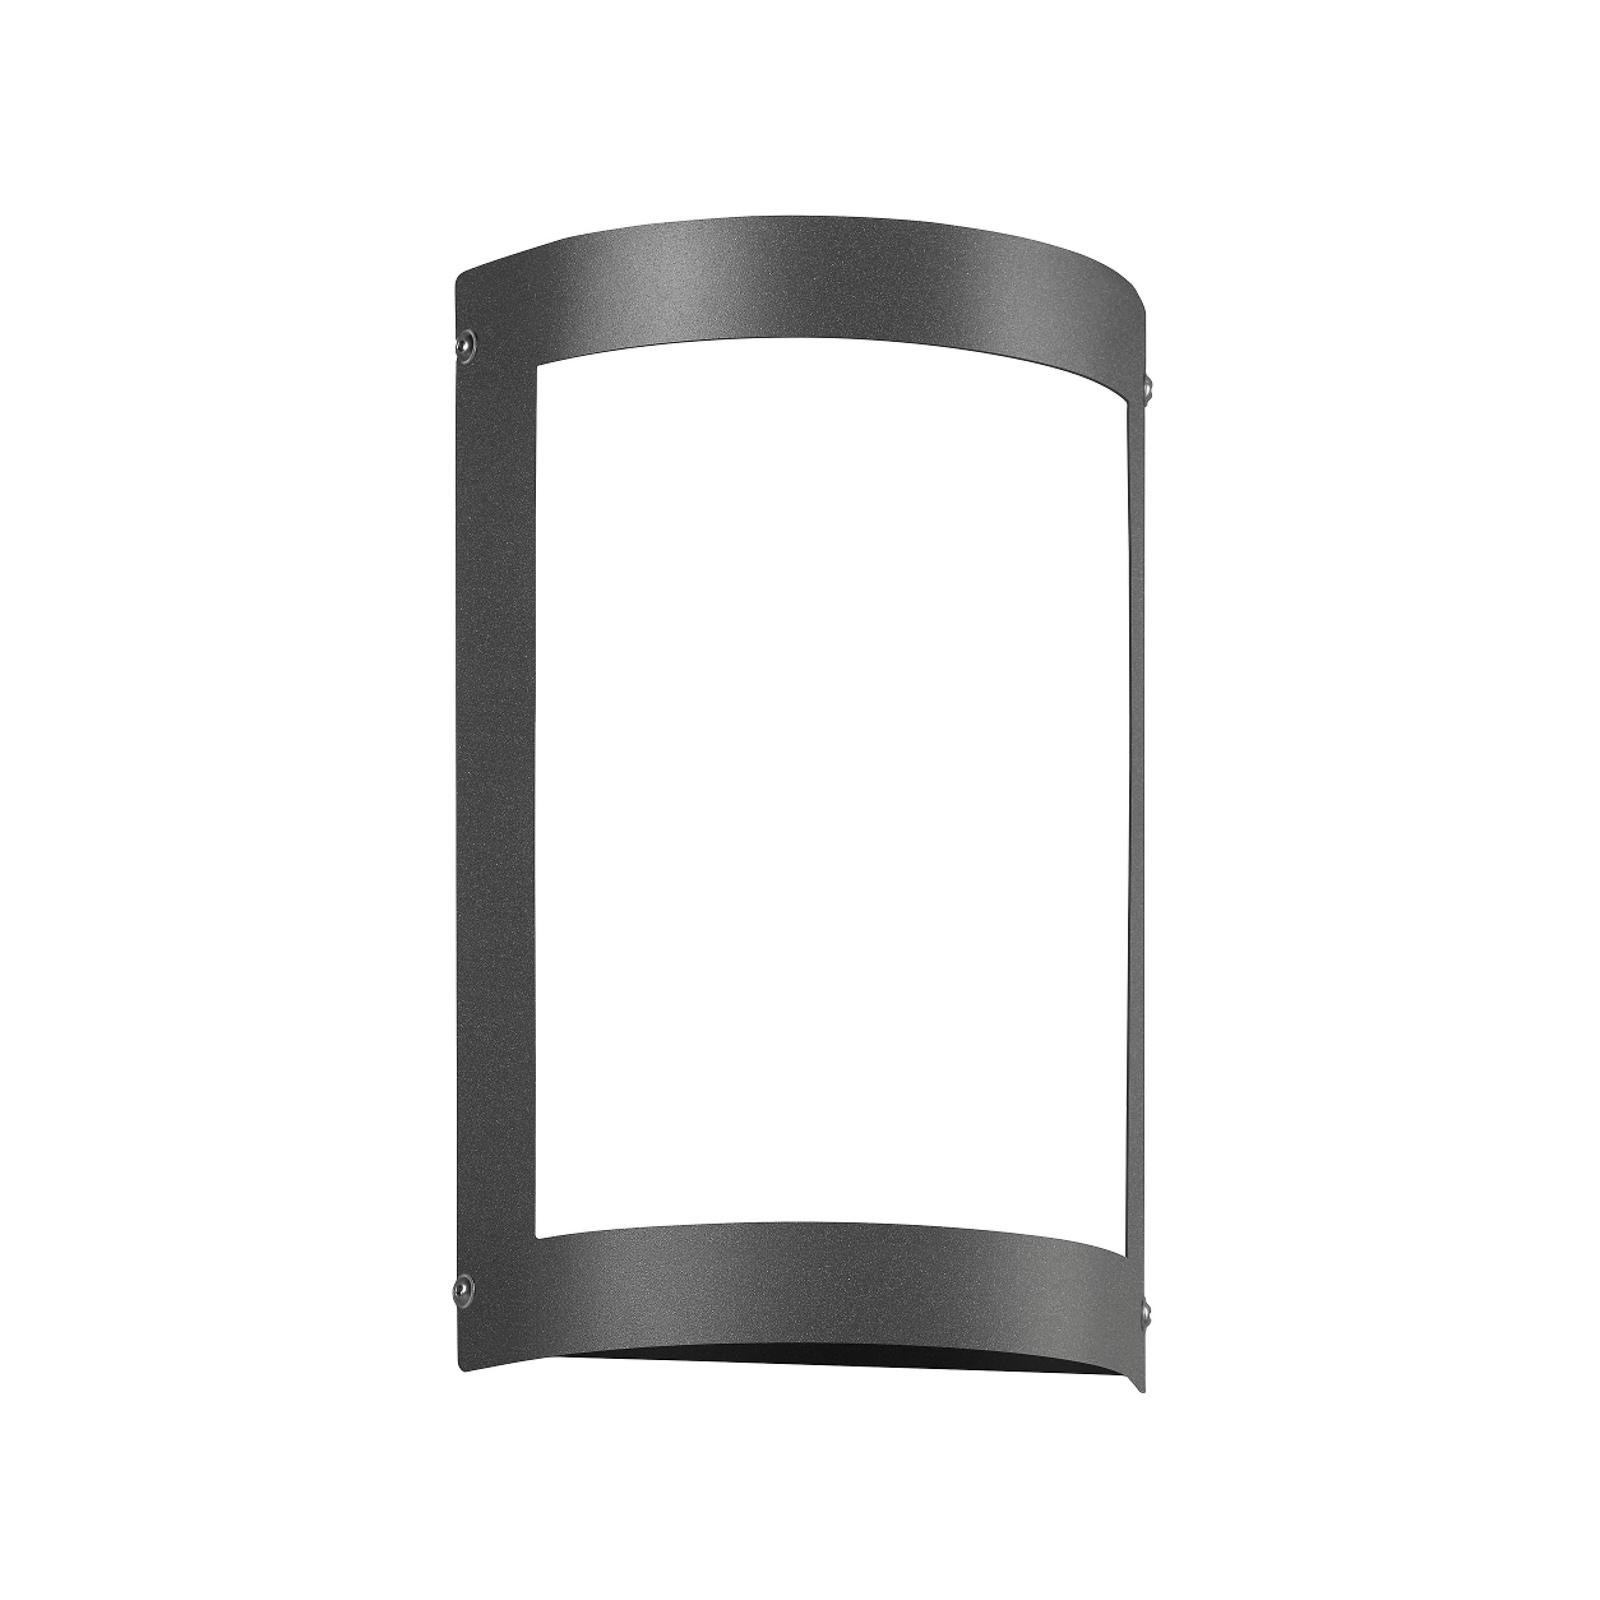 LED-Außenlampe Aqua Marco ohne Raster, anthrazit